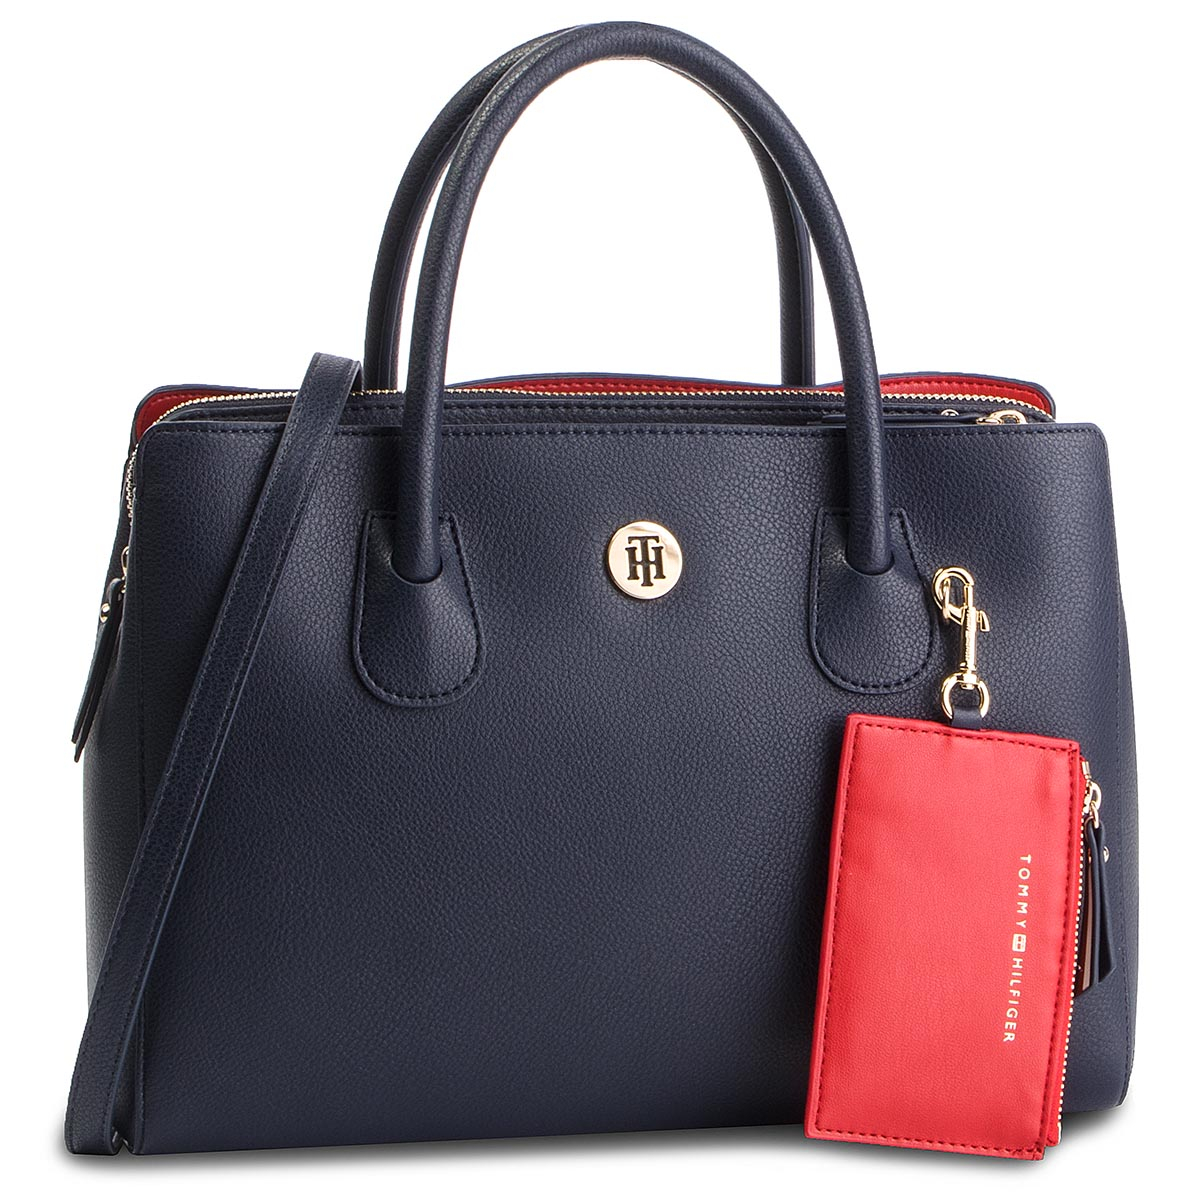 8d2edd332b54b Handbag TOMMY HILFIGER - Cool Hardware Med Satchel Stripe AW0AW04946 ...